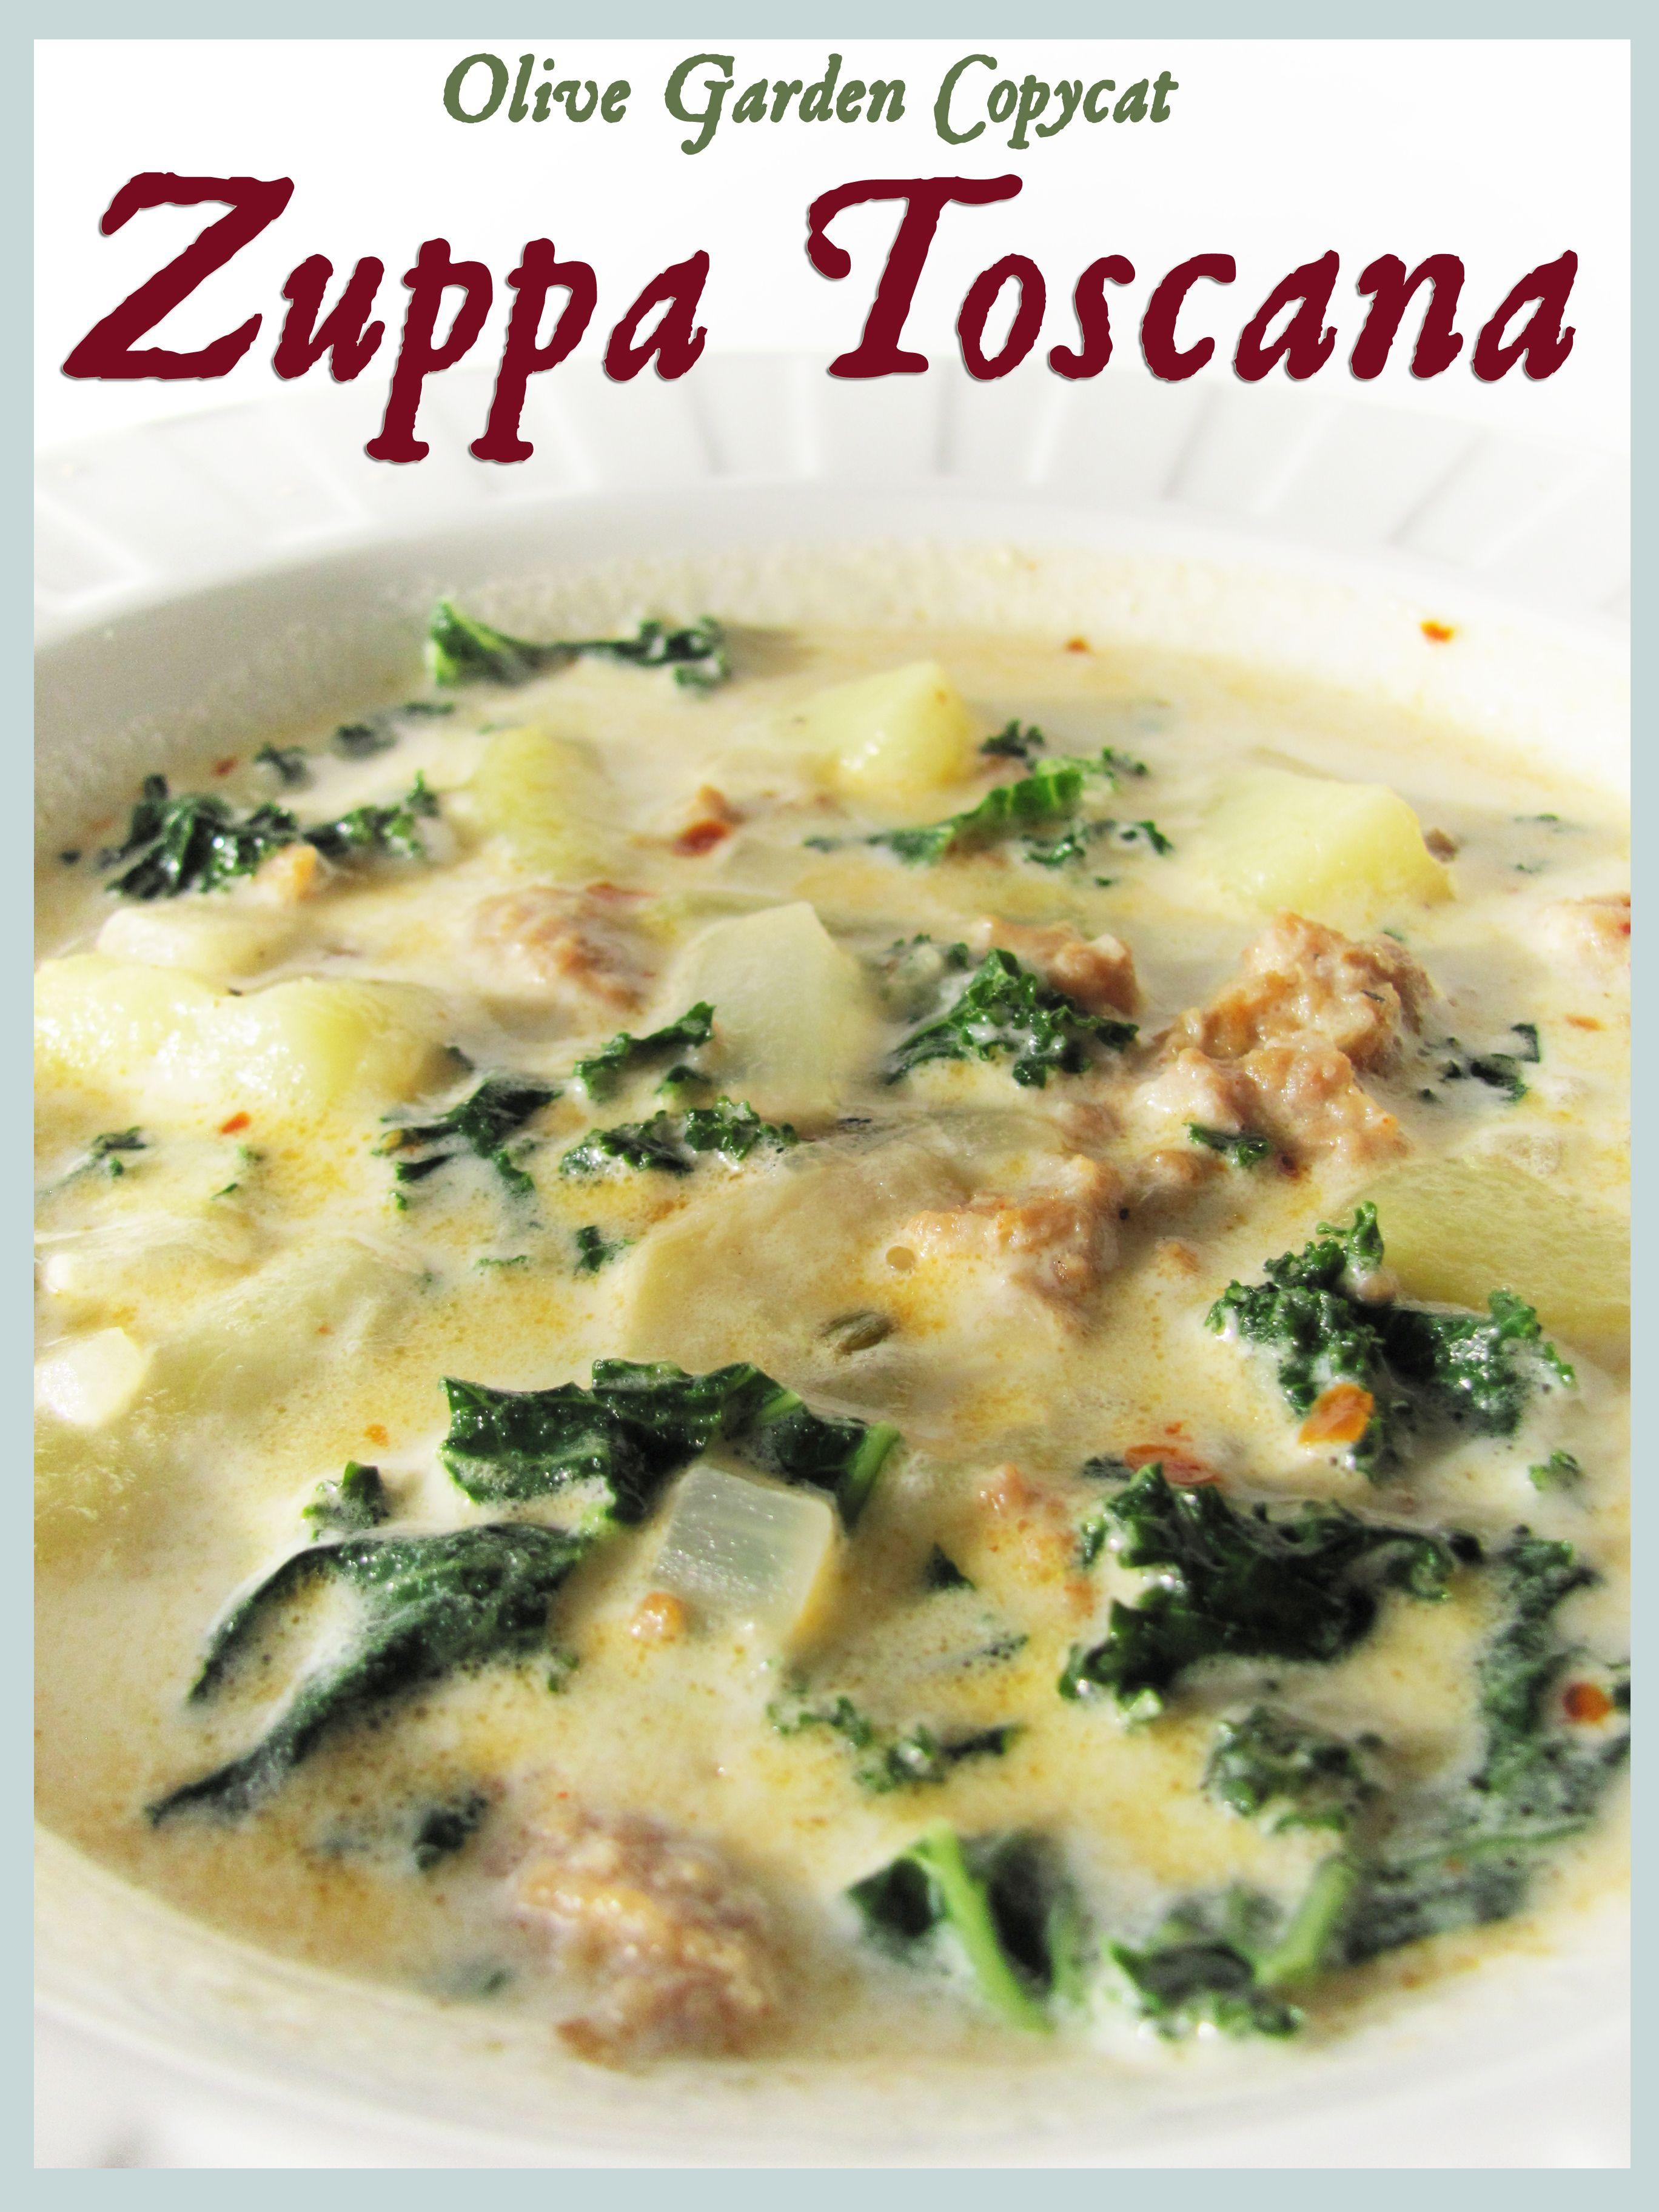 Olive Garden Copycat Zuppa Toscana Recipe Food Recipes